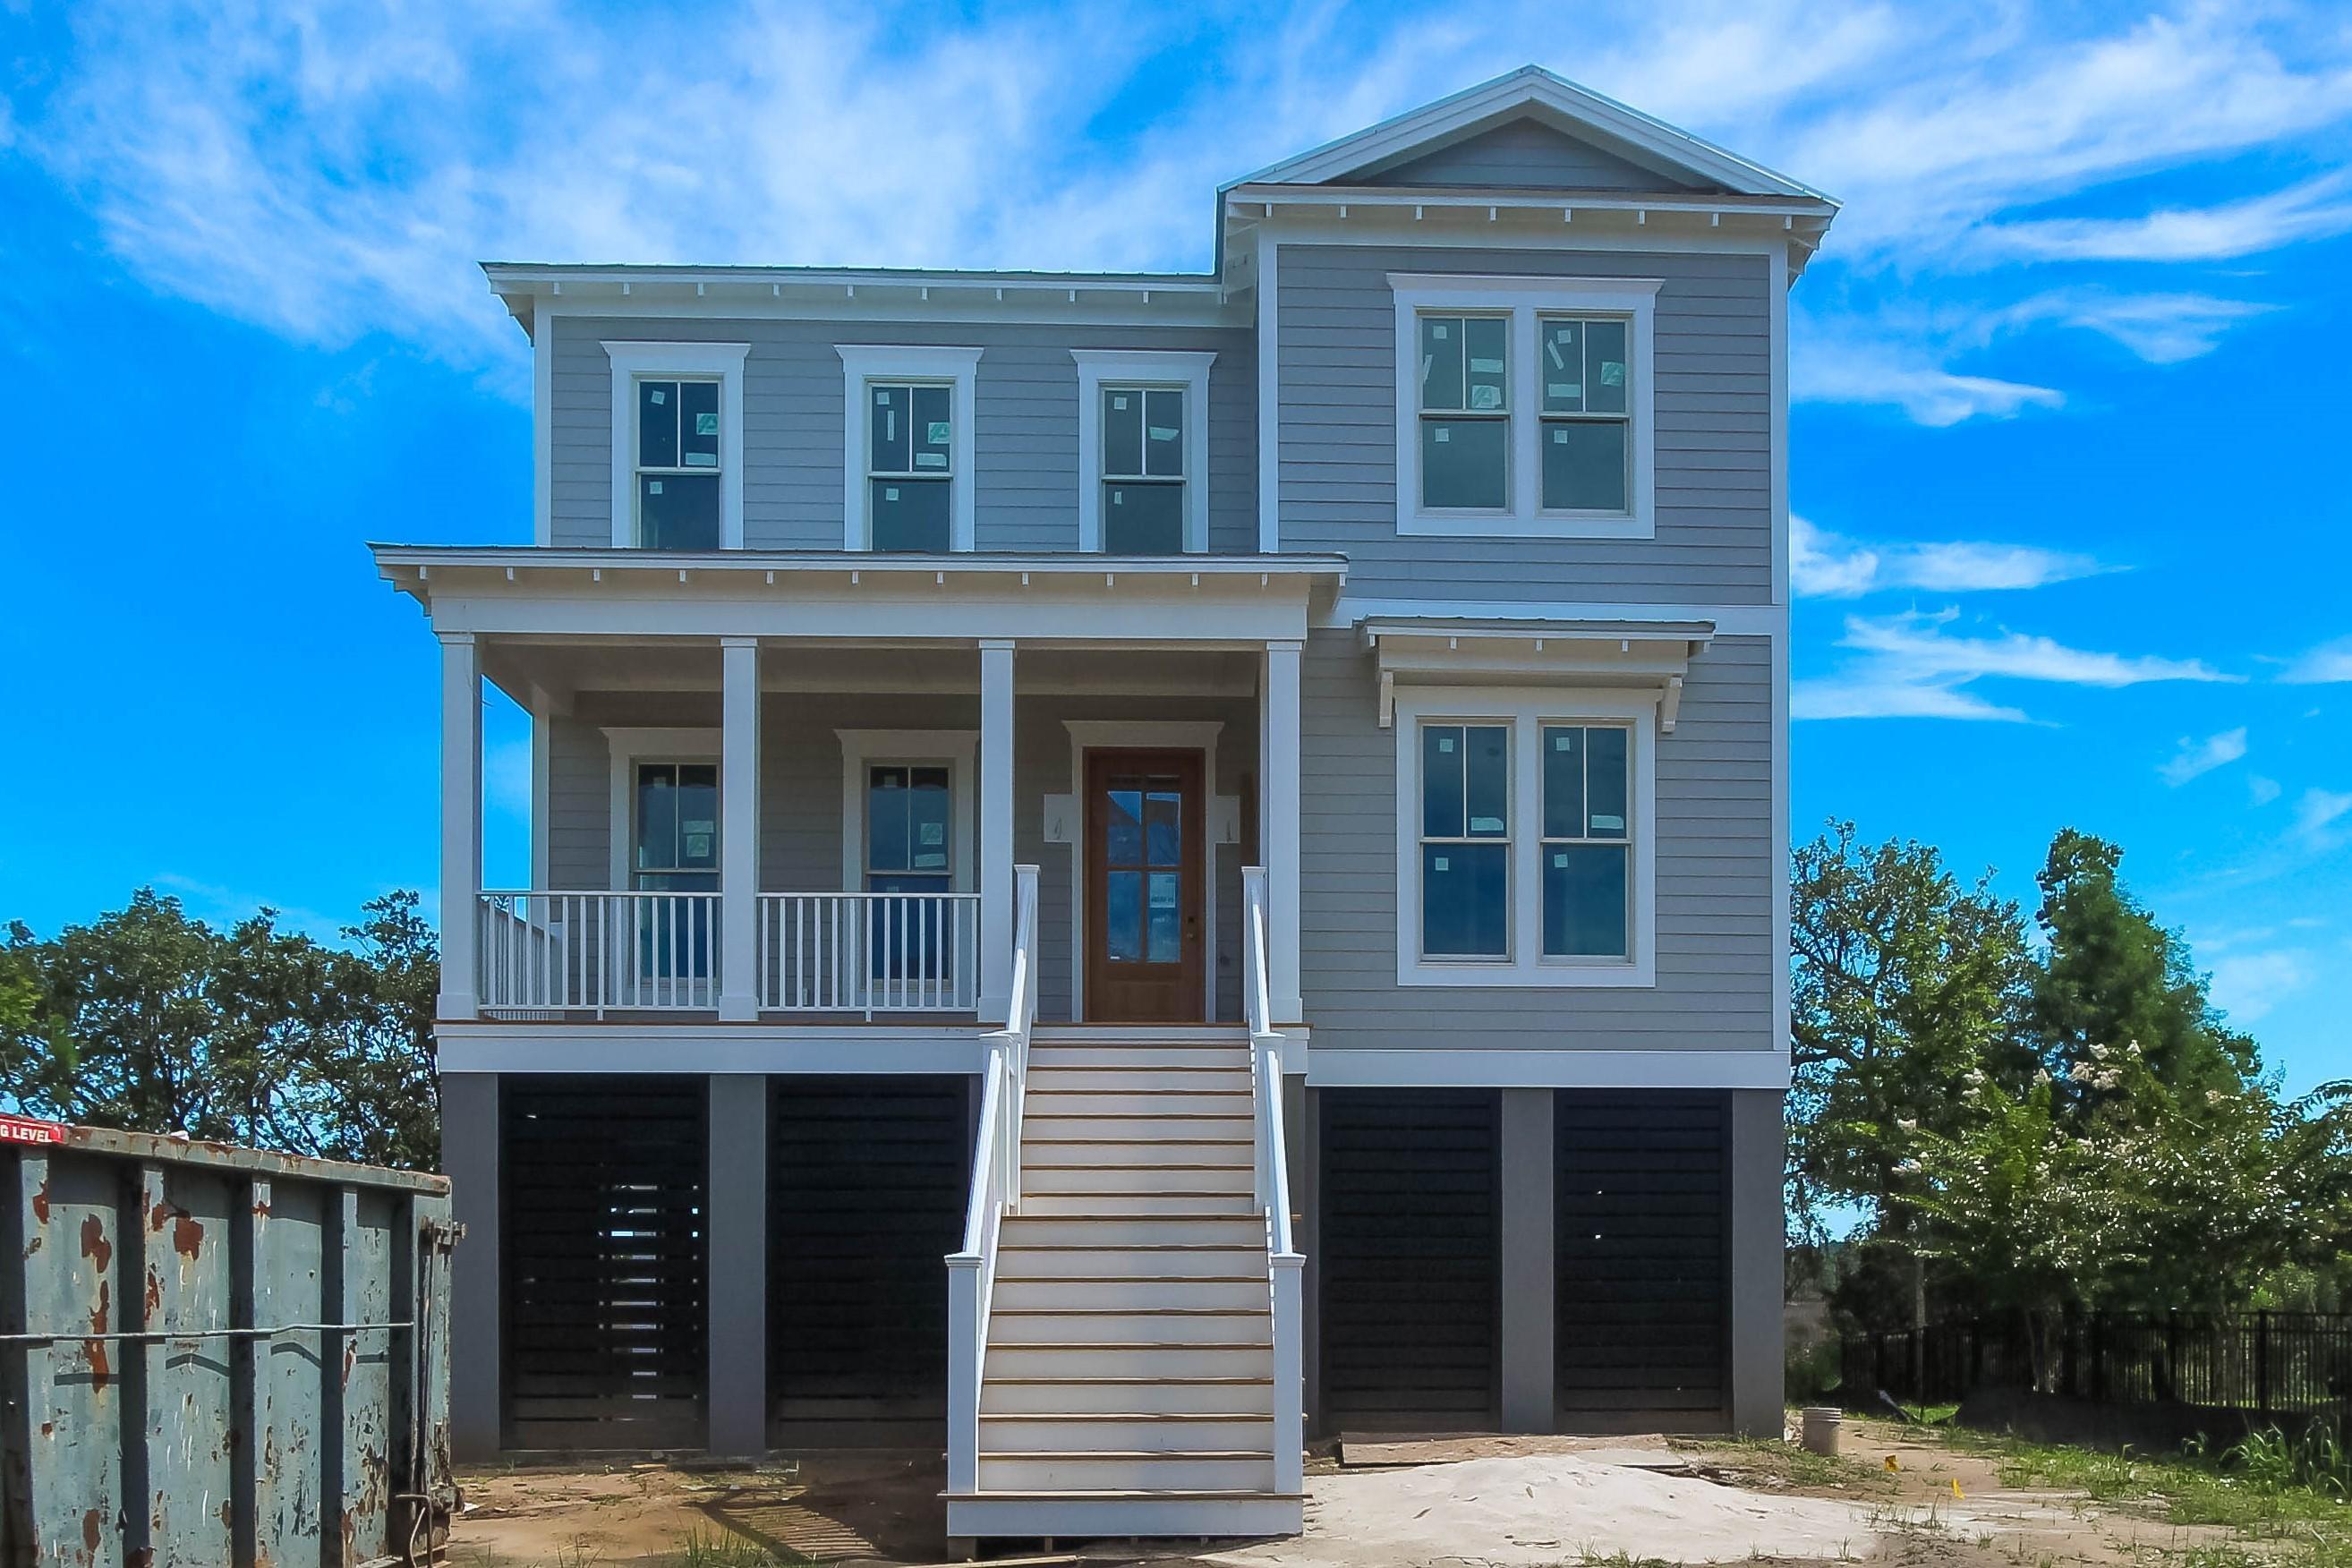 Home for sale 1813 Rushland Grove Lane, Rushland, Johns Island, SC